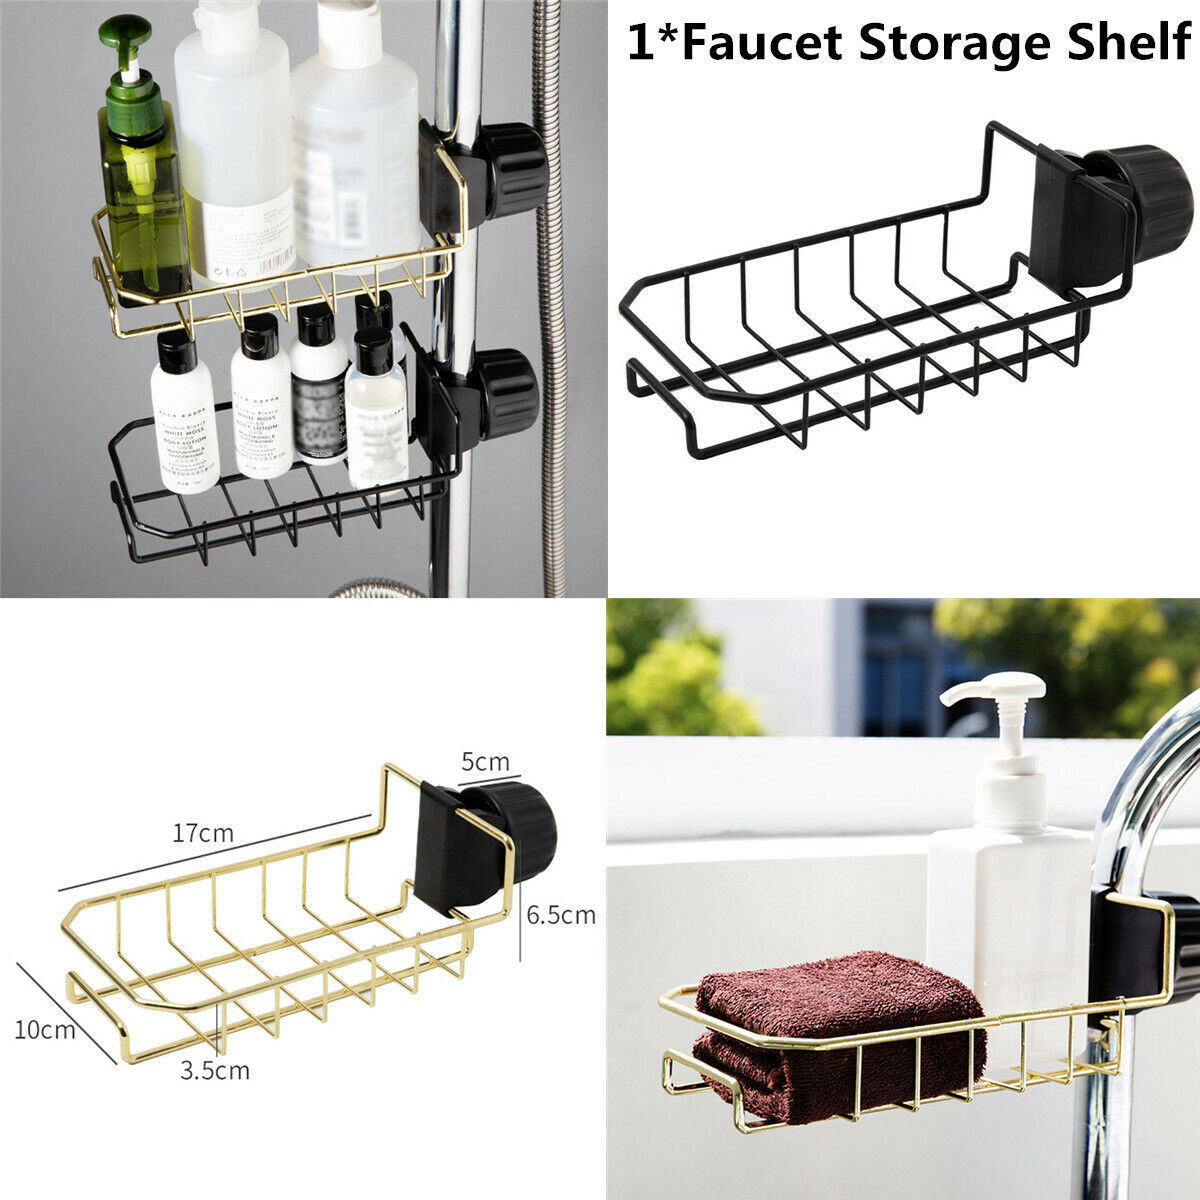 1xdrain Rack Storage Organizer Holder Shelf For Kitchen Sink Faucet Sponge Soap For Sale Online